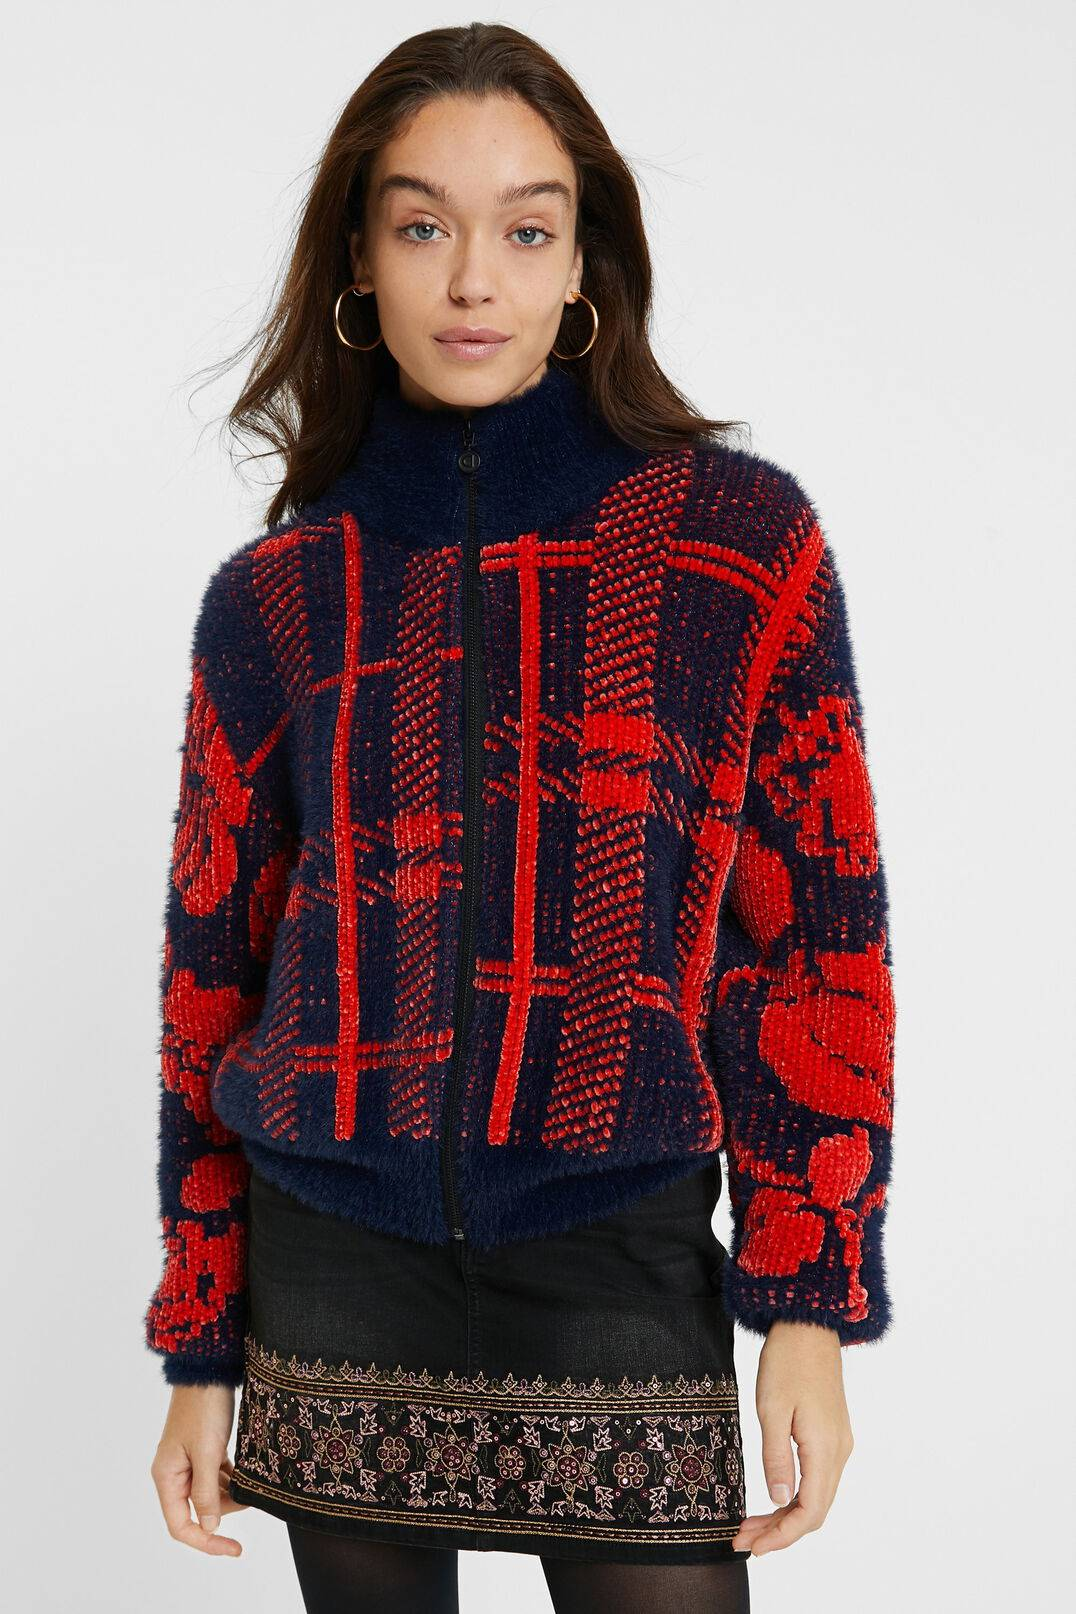 High neck knit jacket